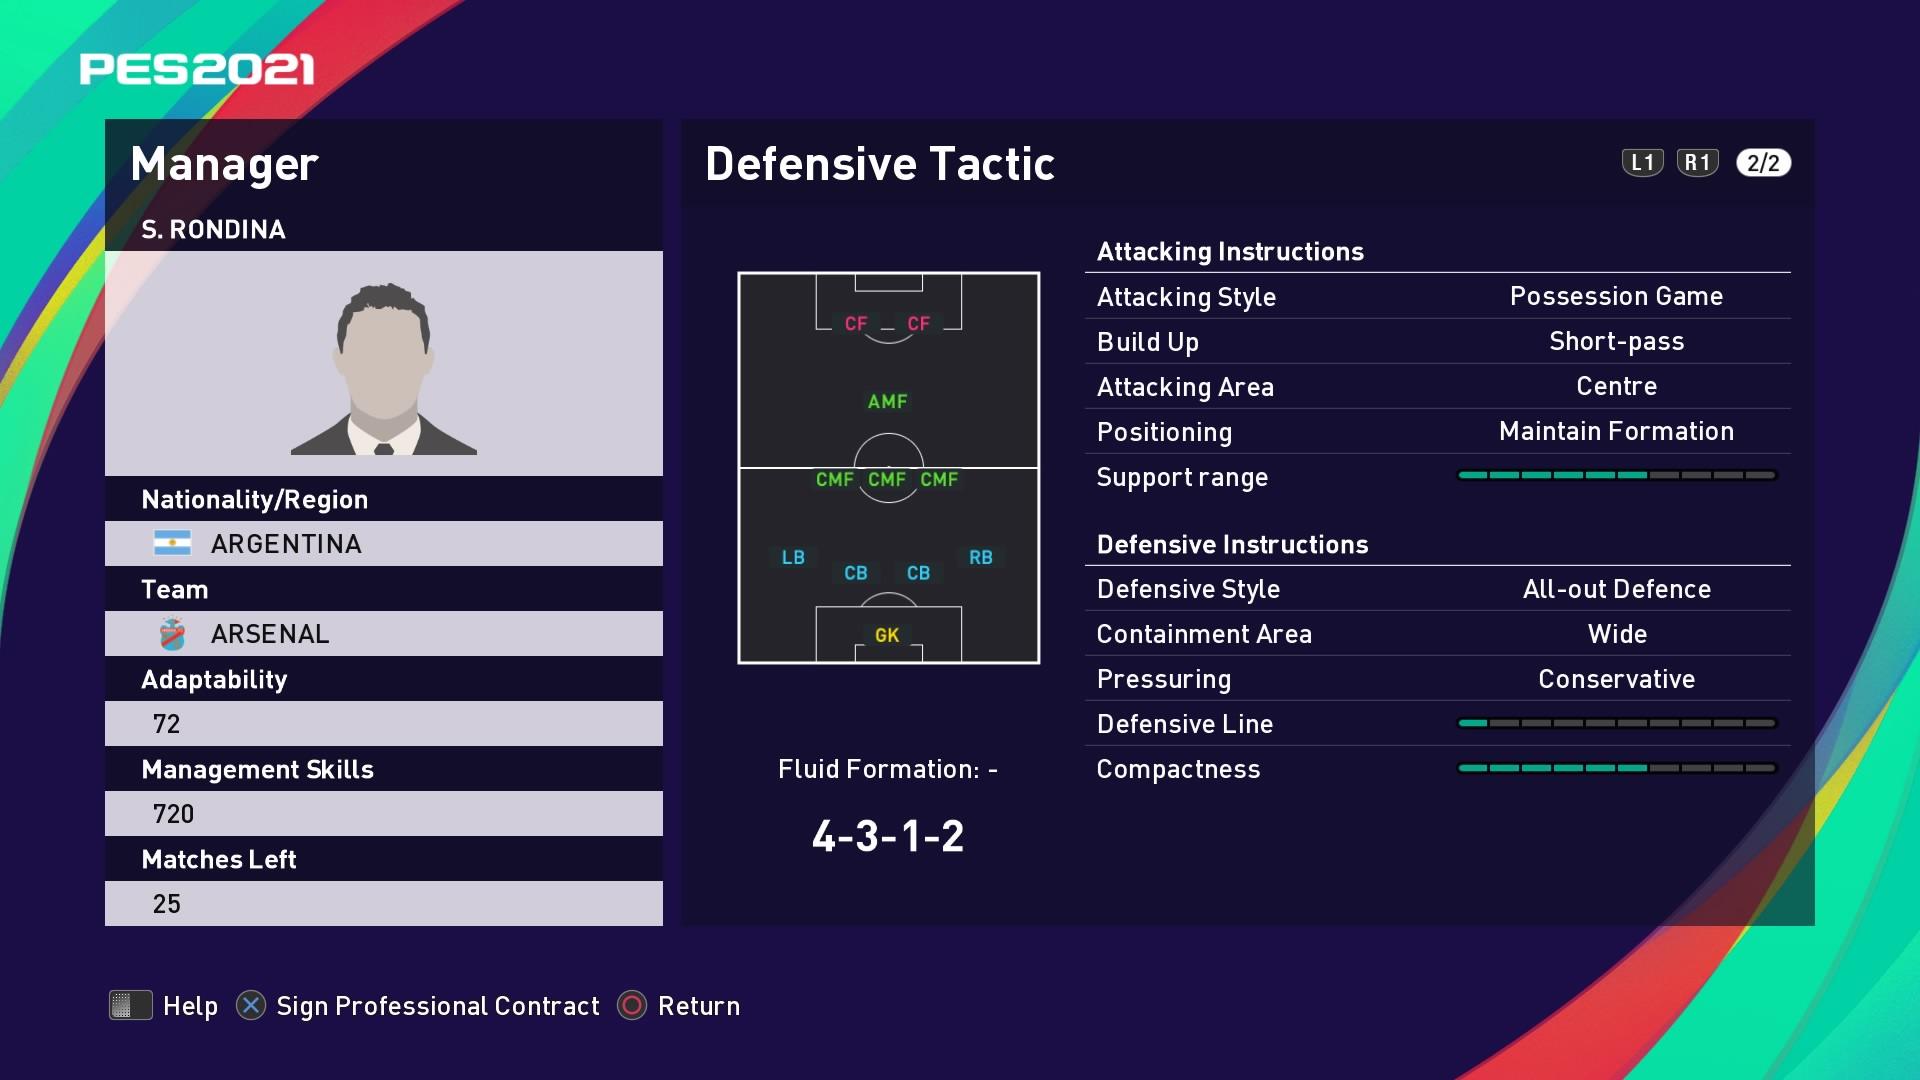 S. Rondina (Sergio Rondina) Defensive Tactic in PES 2021 myClub